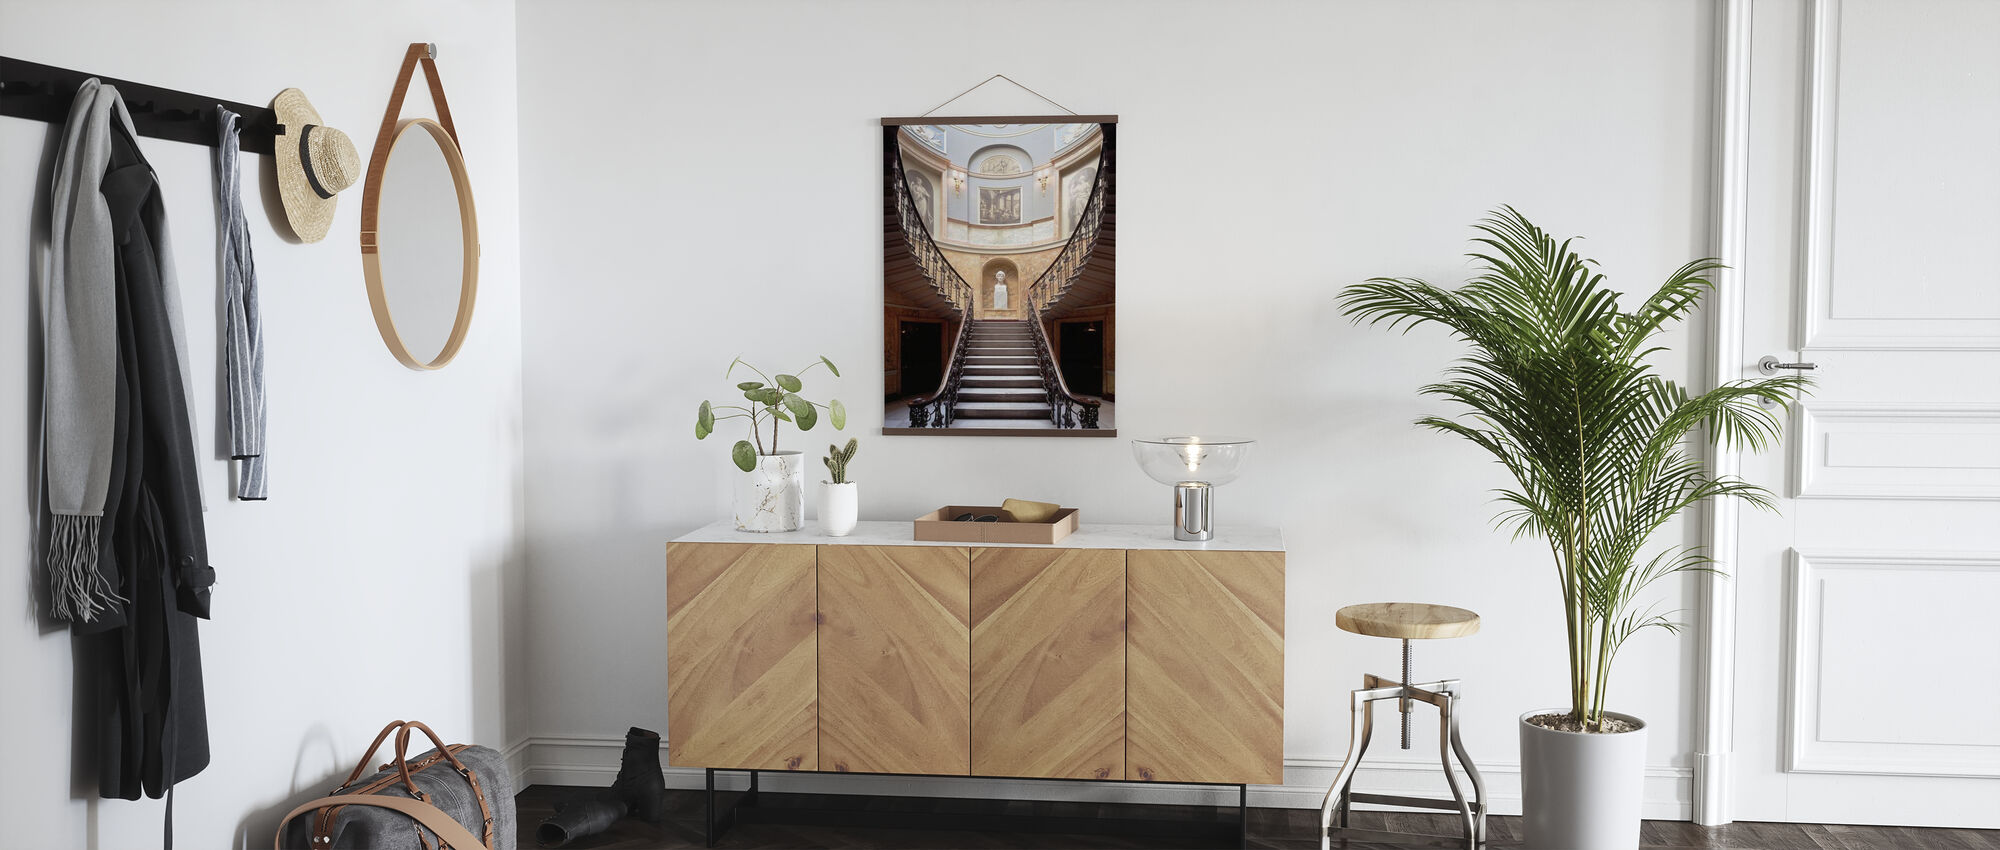 Residential Stairway - Poster - Hallway